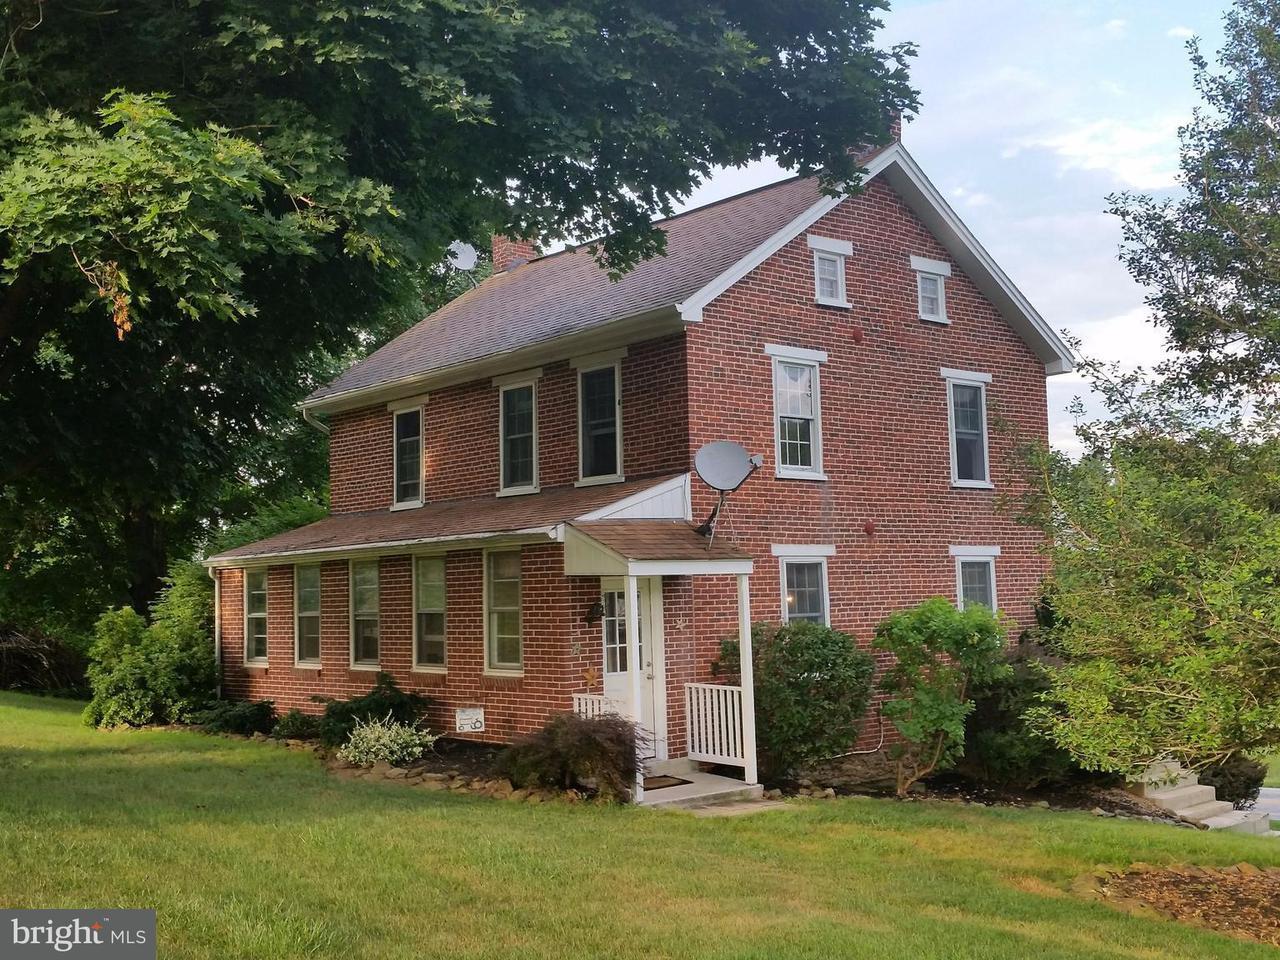 Farm for Sale at 5048 HILDEBRAND Road 5048 HILDEBRAND Road Glen Rock, Pennsylvania 17327 United States